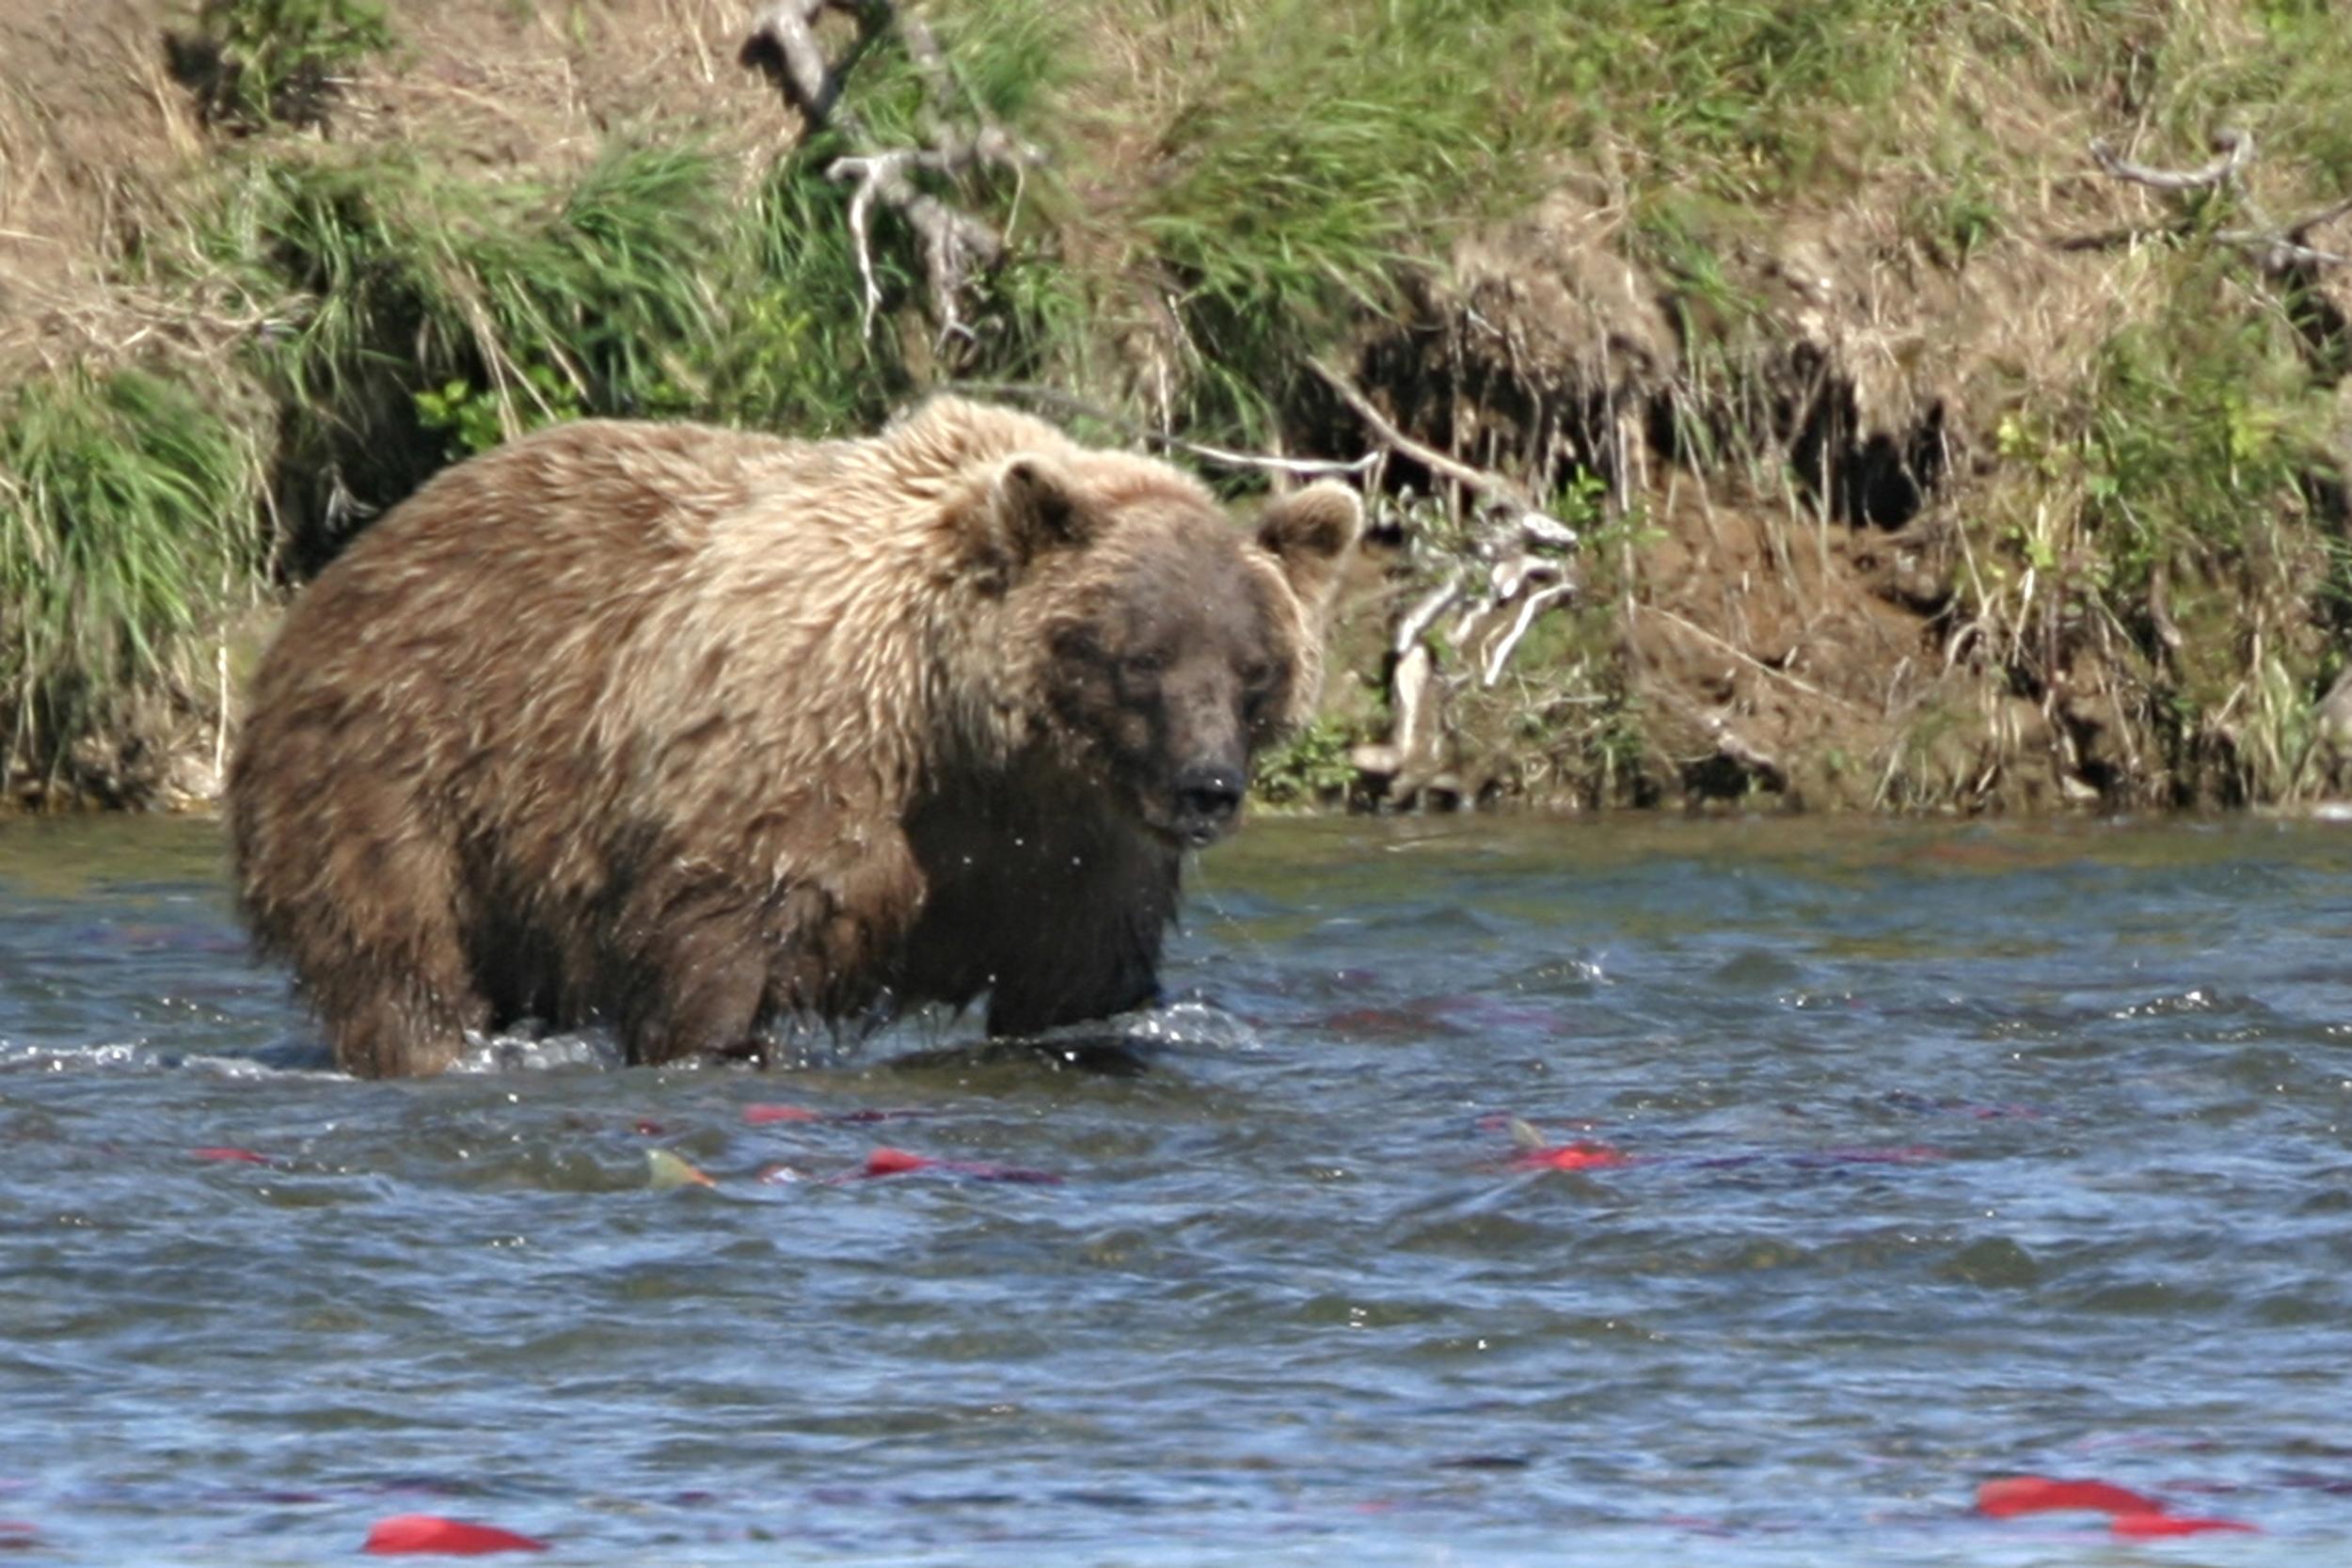 042-Bear 2005 I.jpg